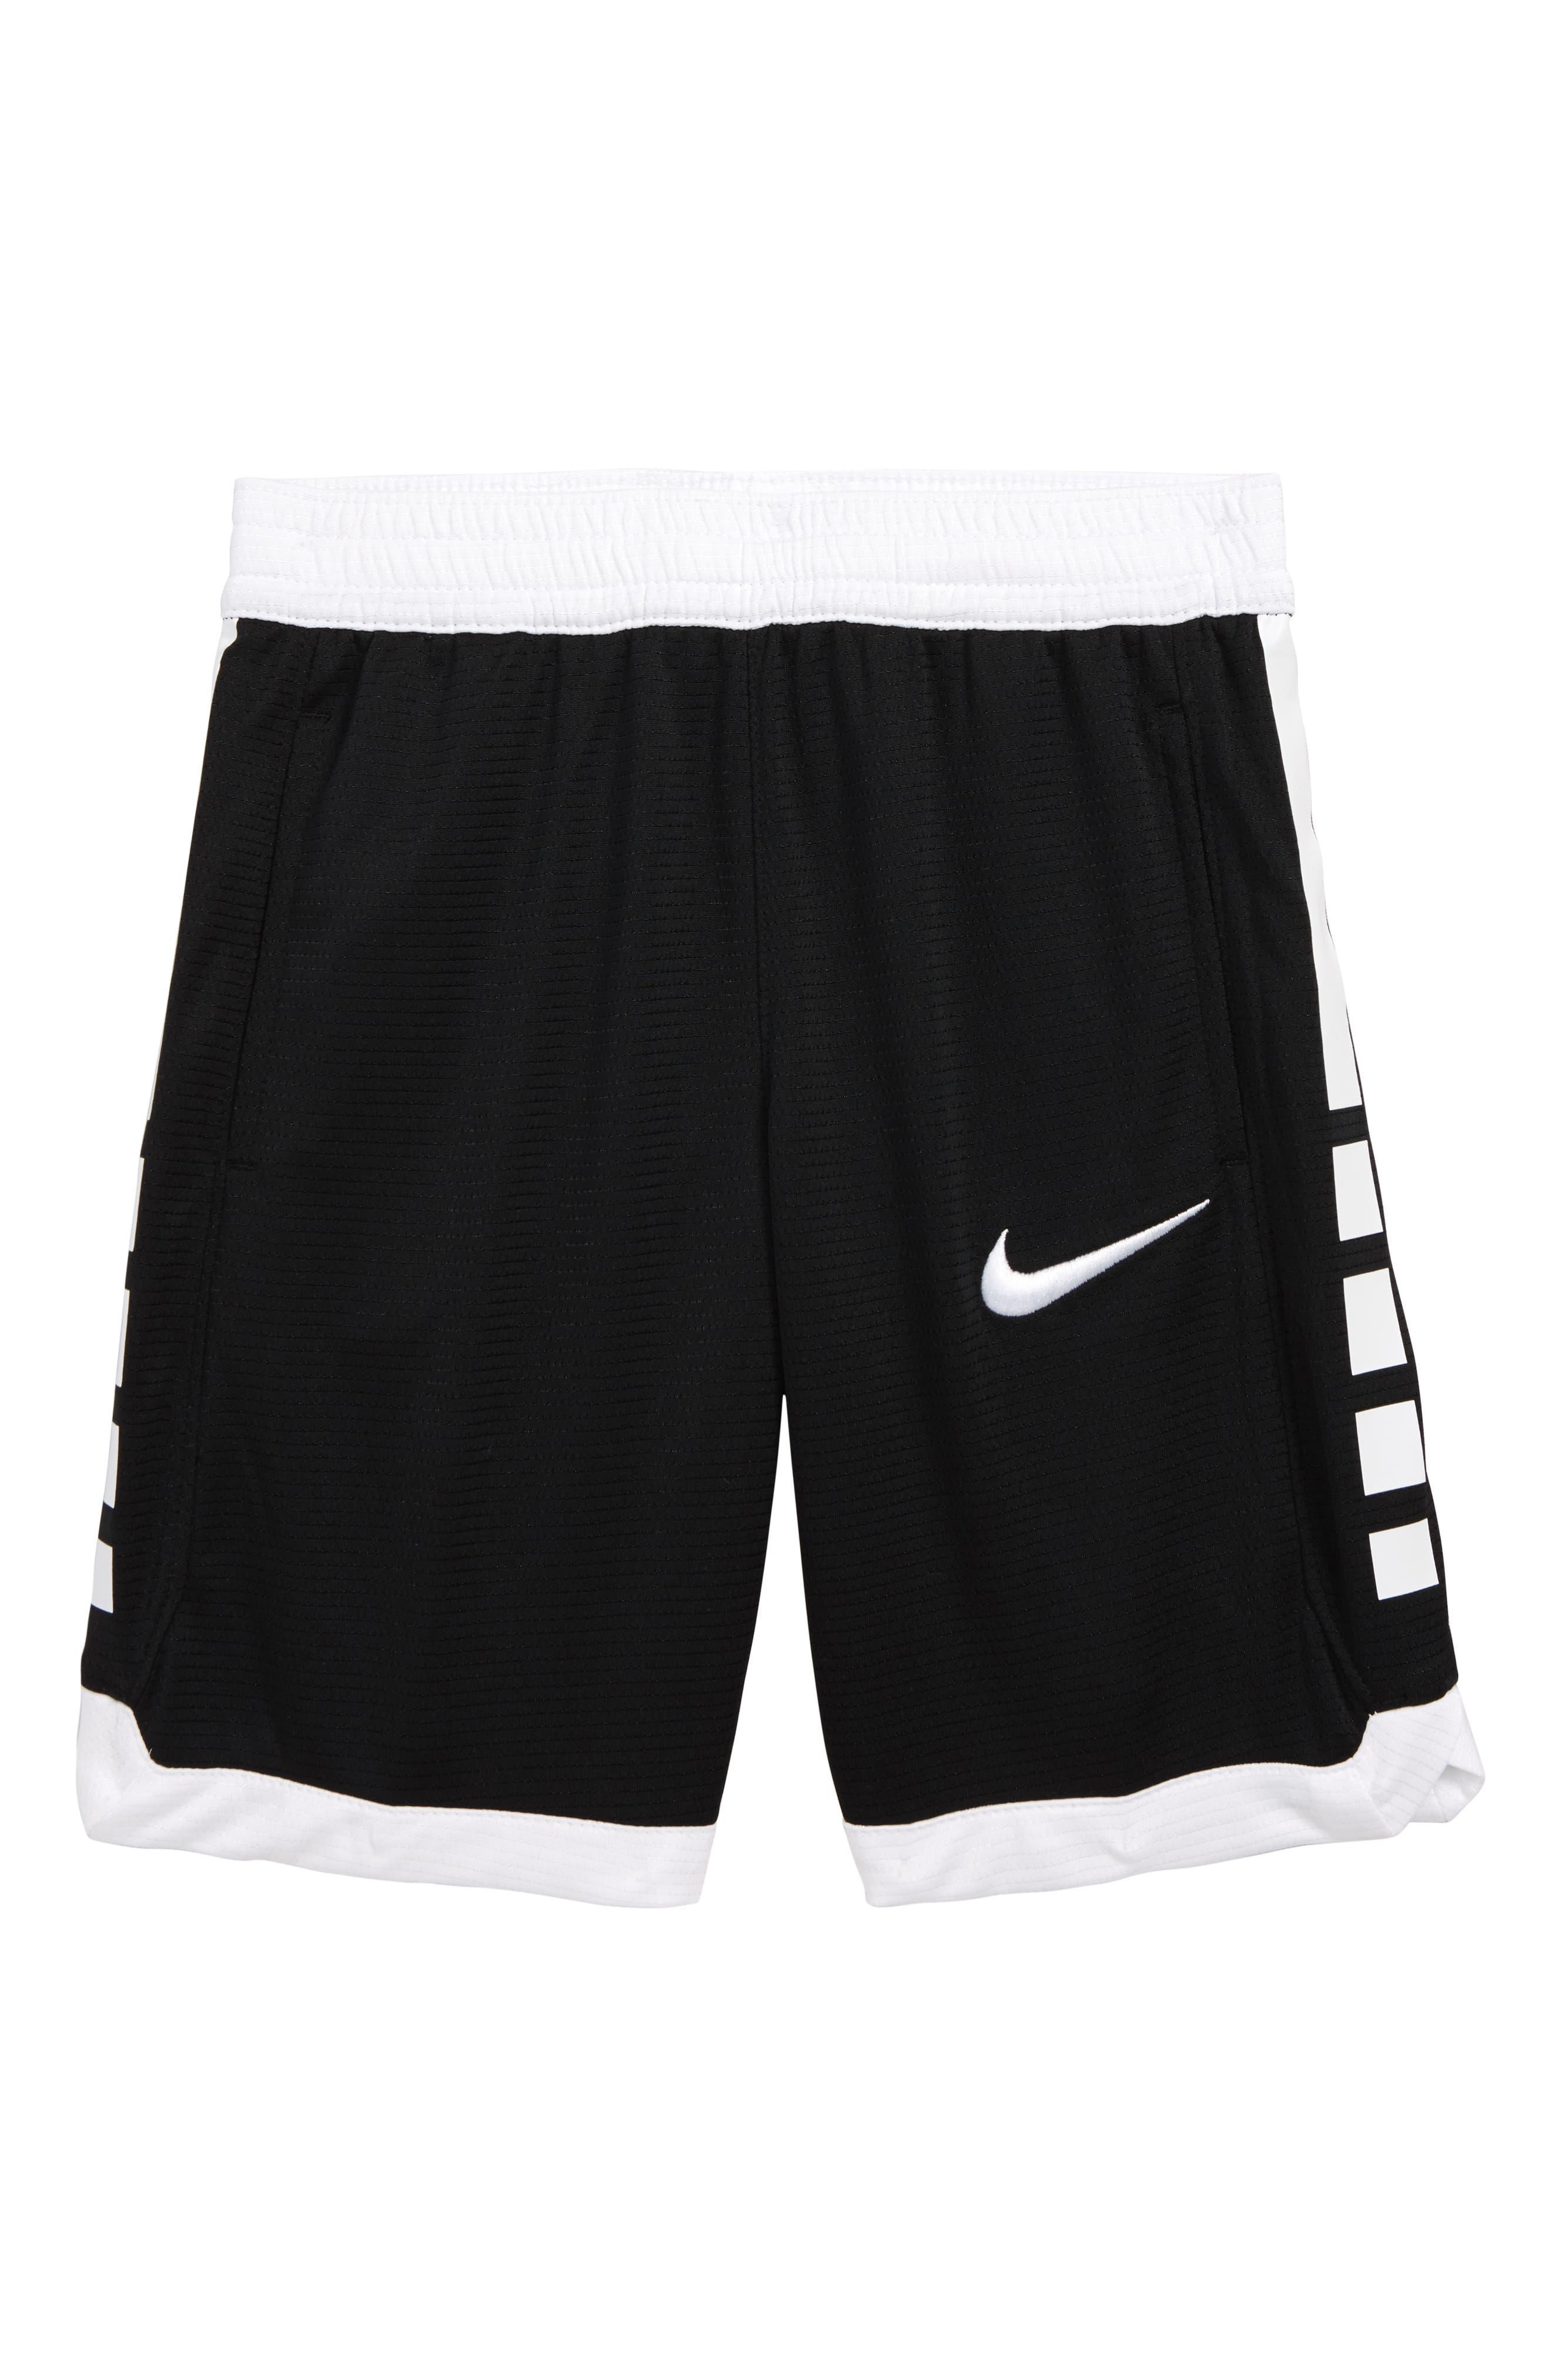 Boys Nike Dry Elite Stripe Athletic Shorts Size 7  Black